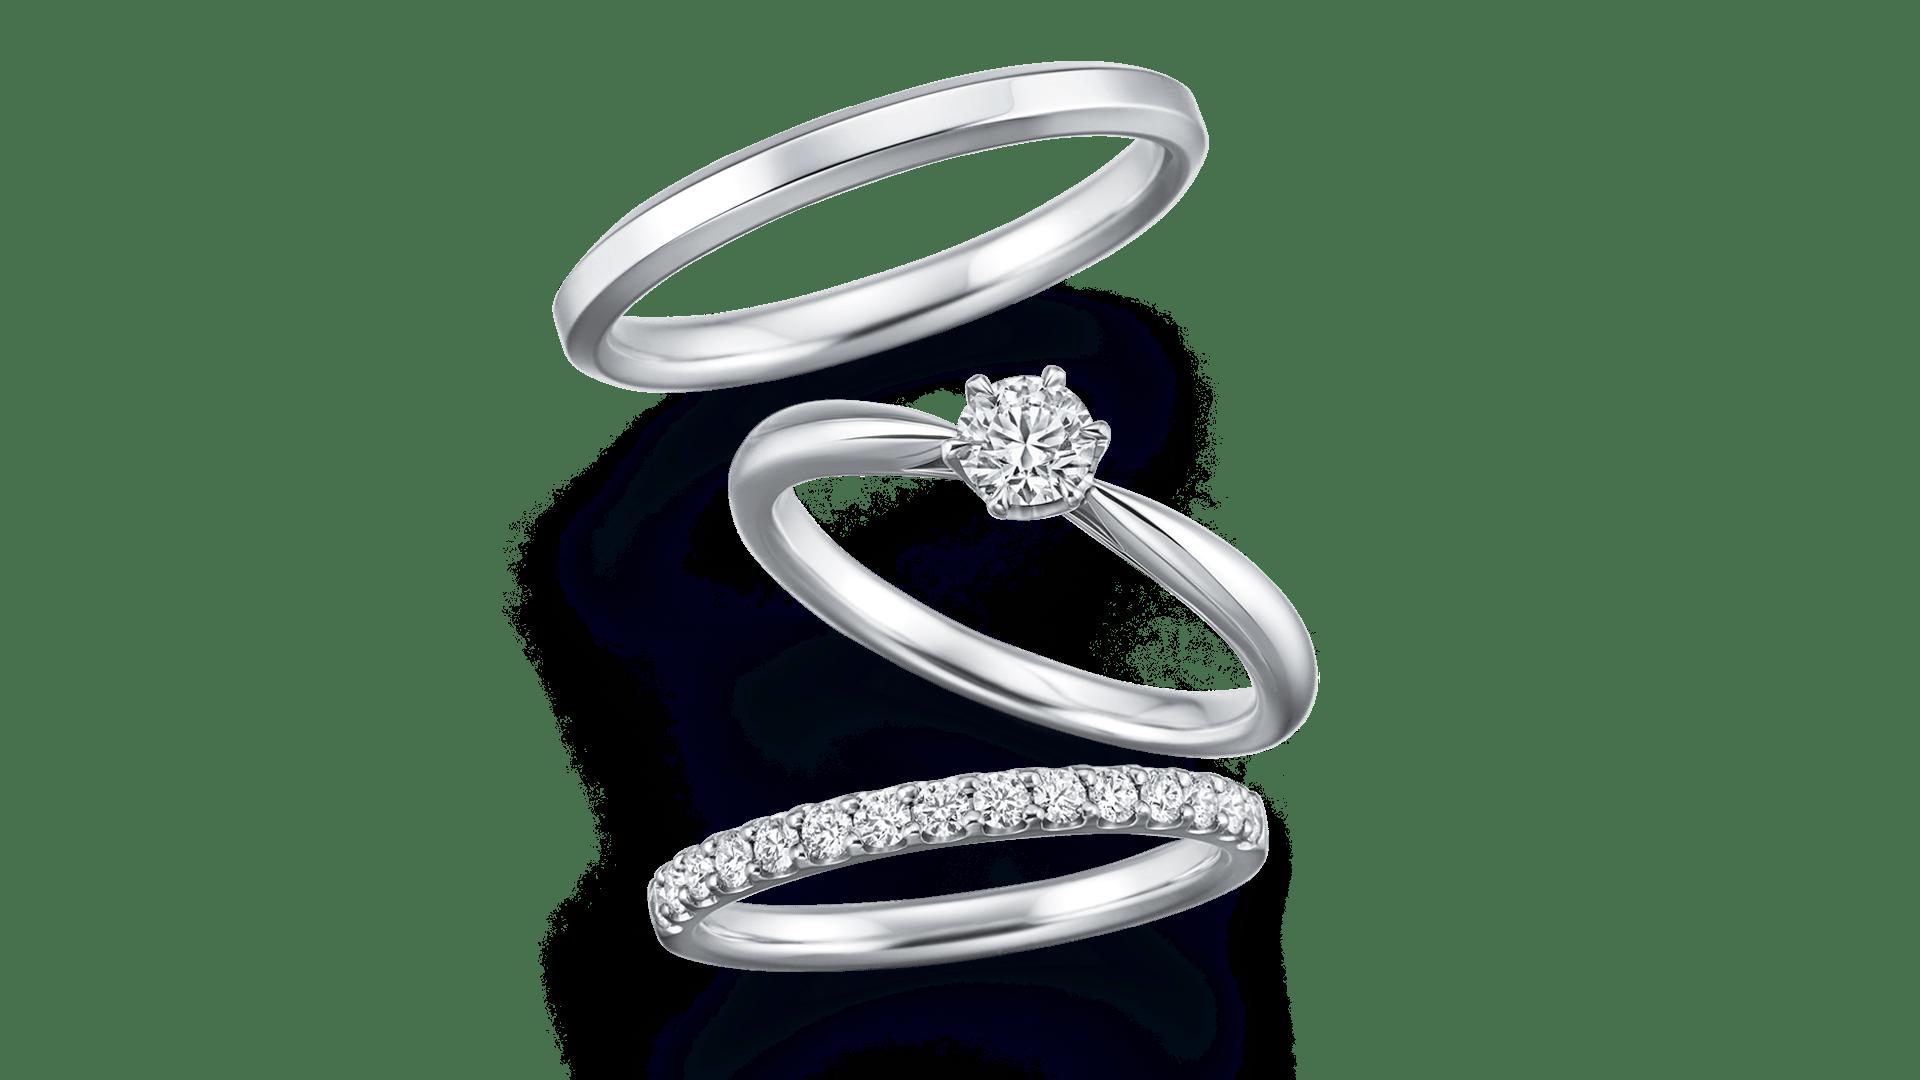 altair&vestalis アルティア&ウェスタリス | セットリングサムネイル 2